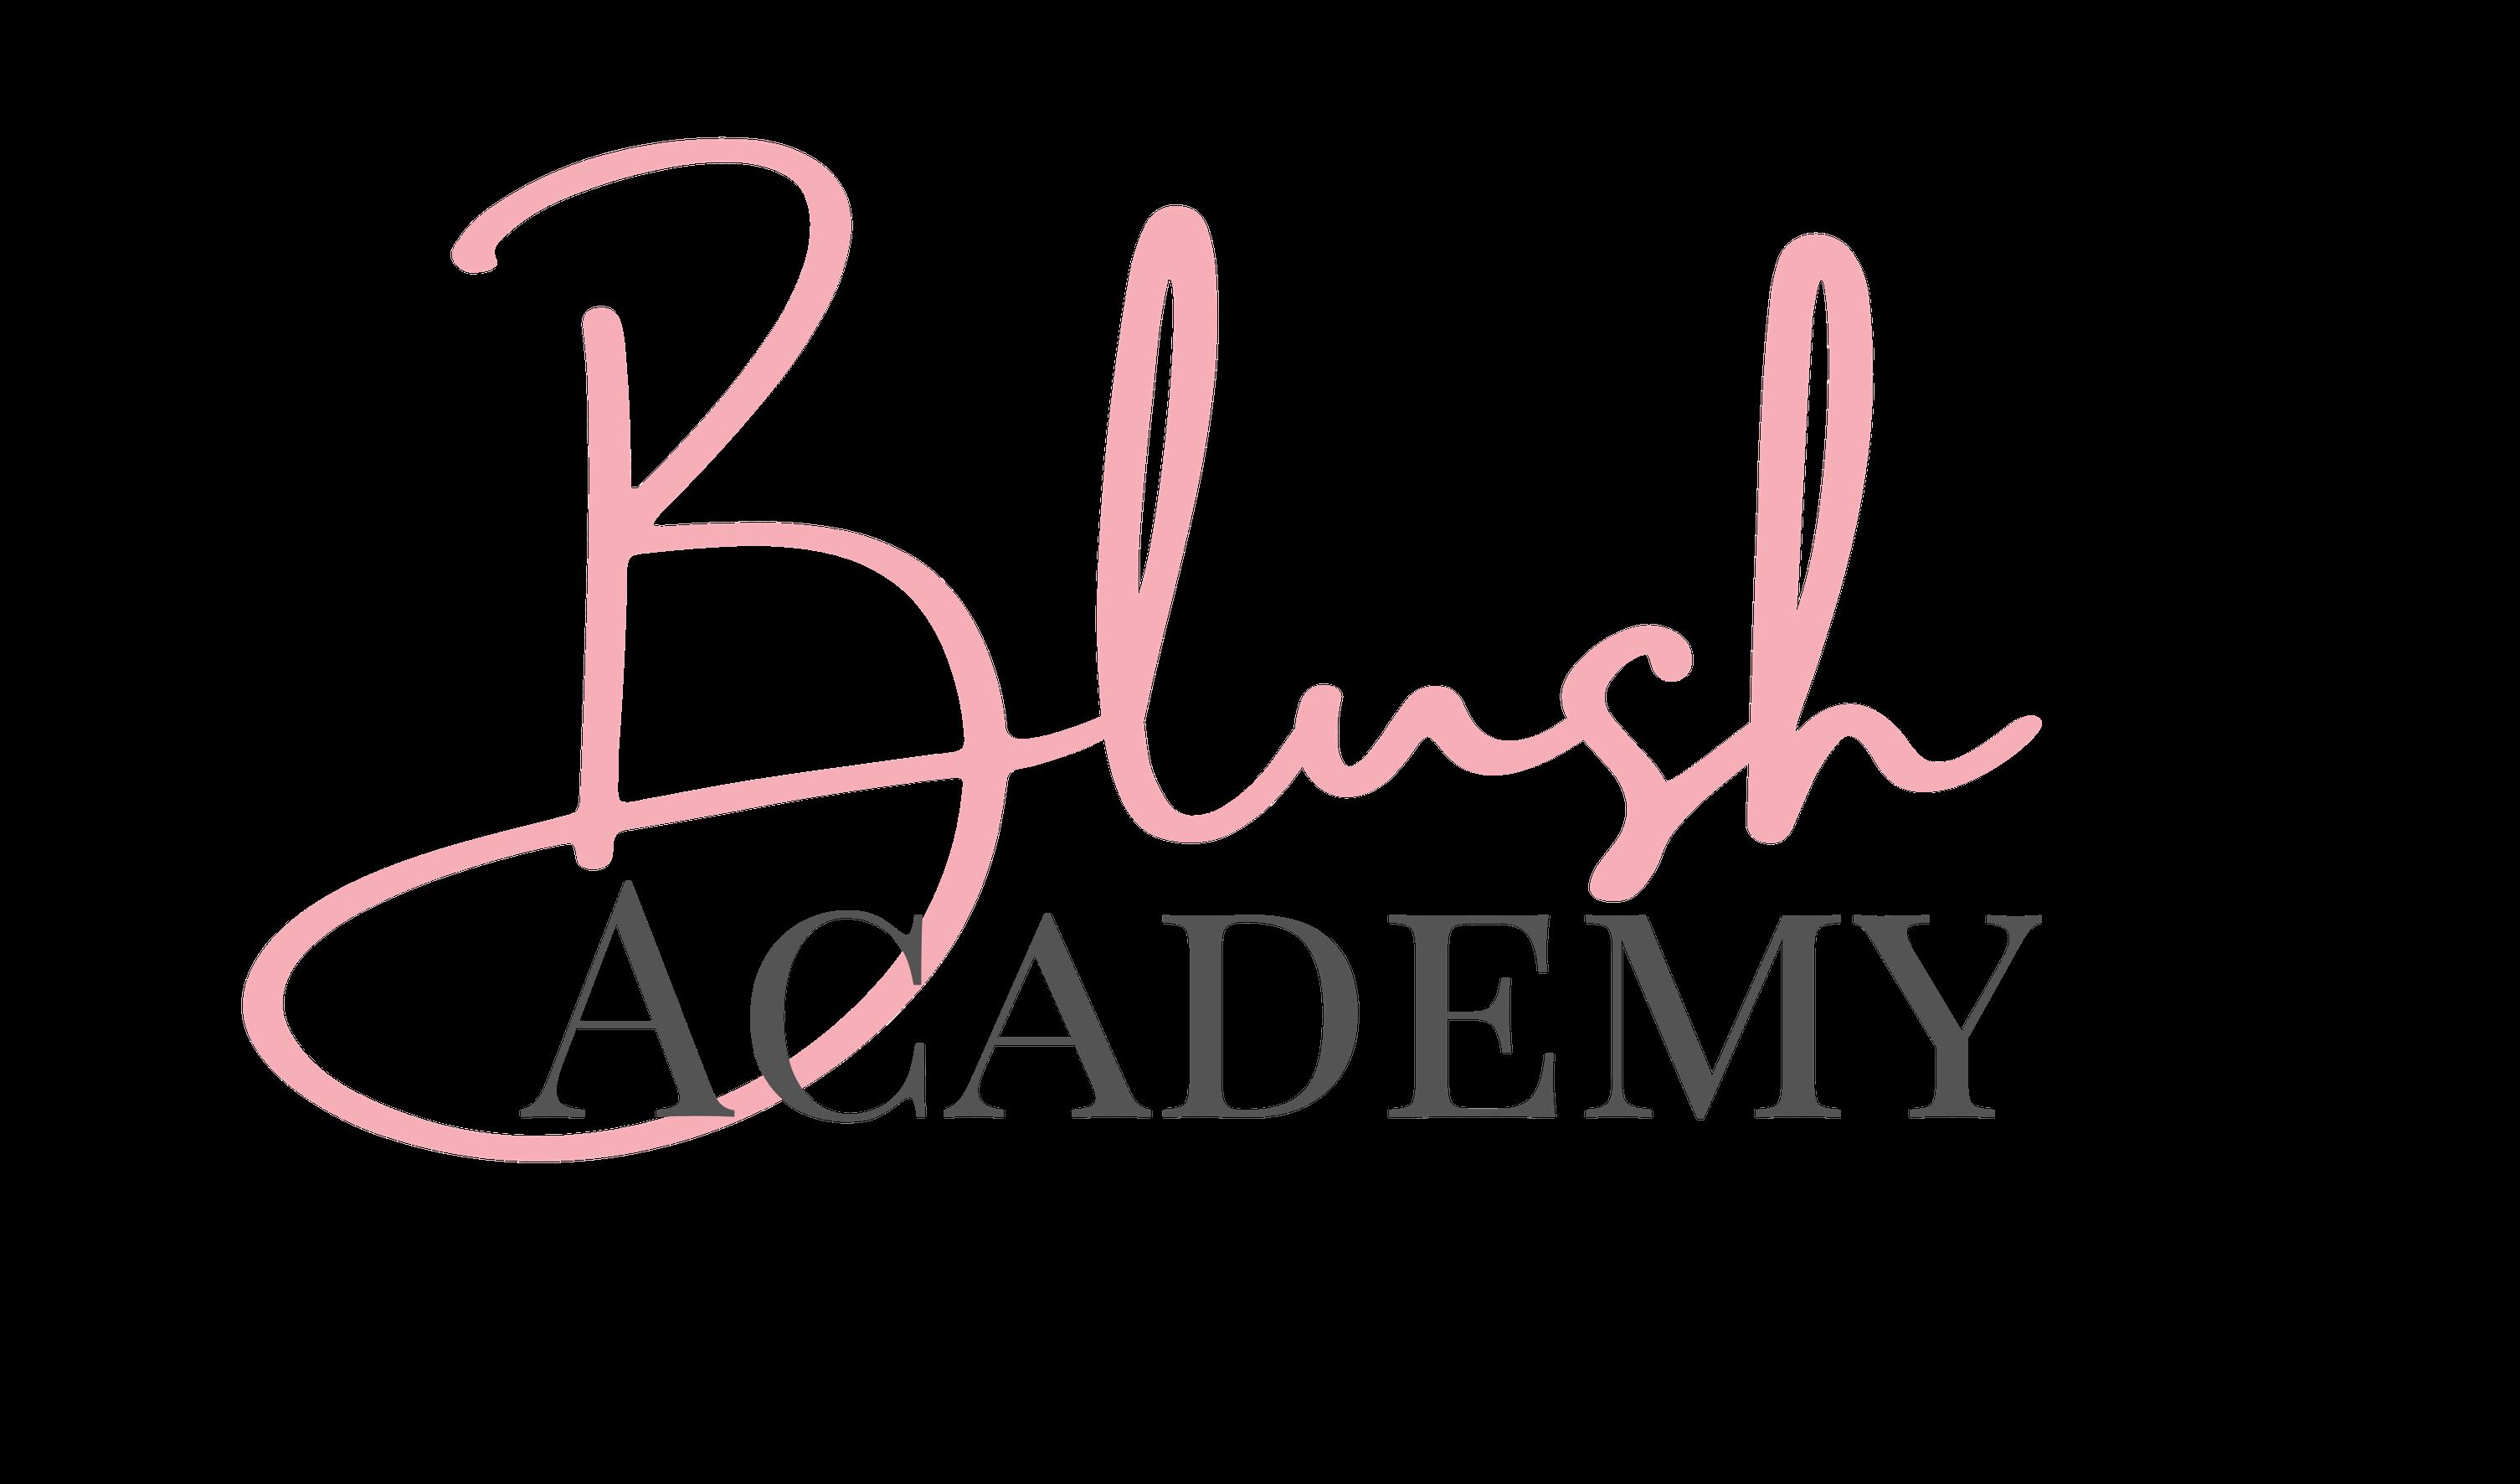 Blush Academy